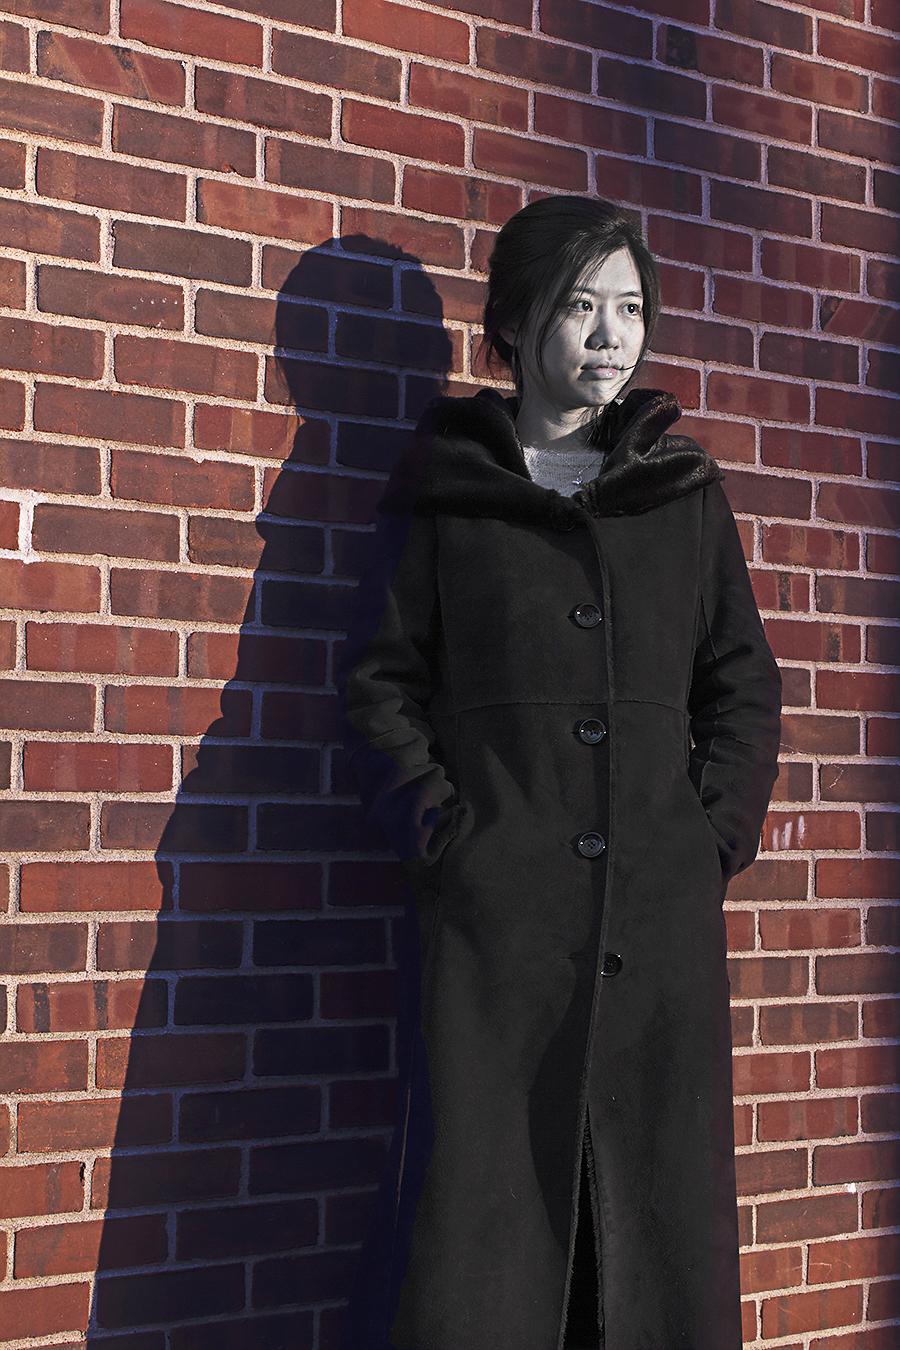 Hong_Li_Photography_Class_Sad_Sadness_Feburary_09_2017_Location_Meyerson_Hall_School_of_Design_Snow_Landscape_Architecture